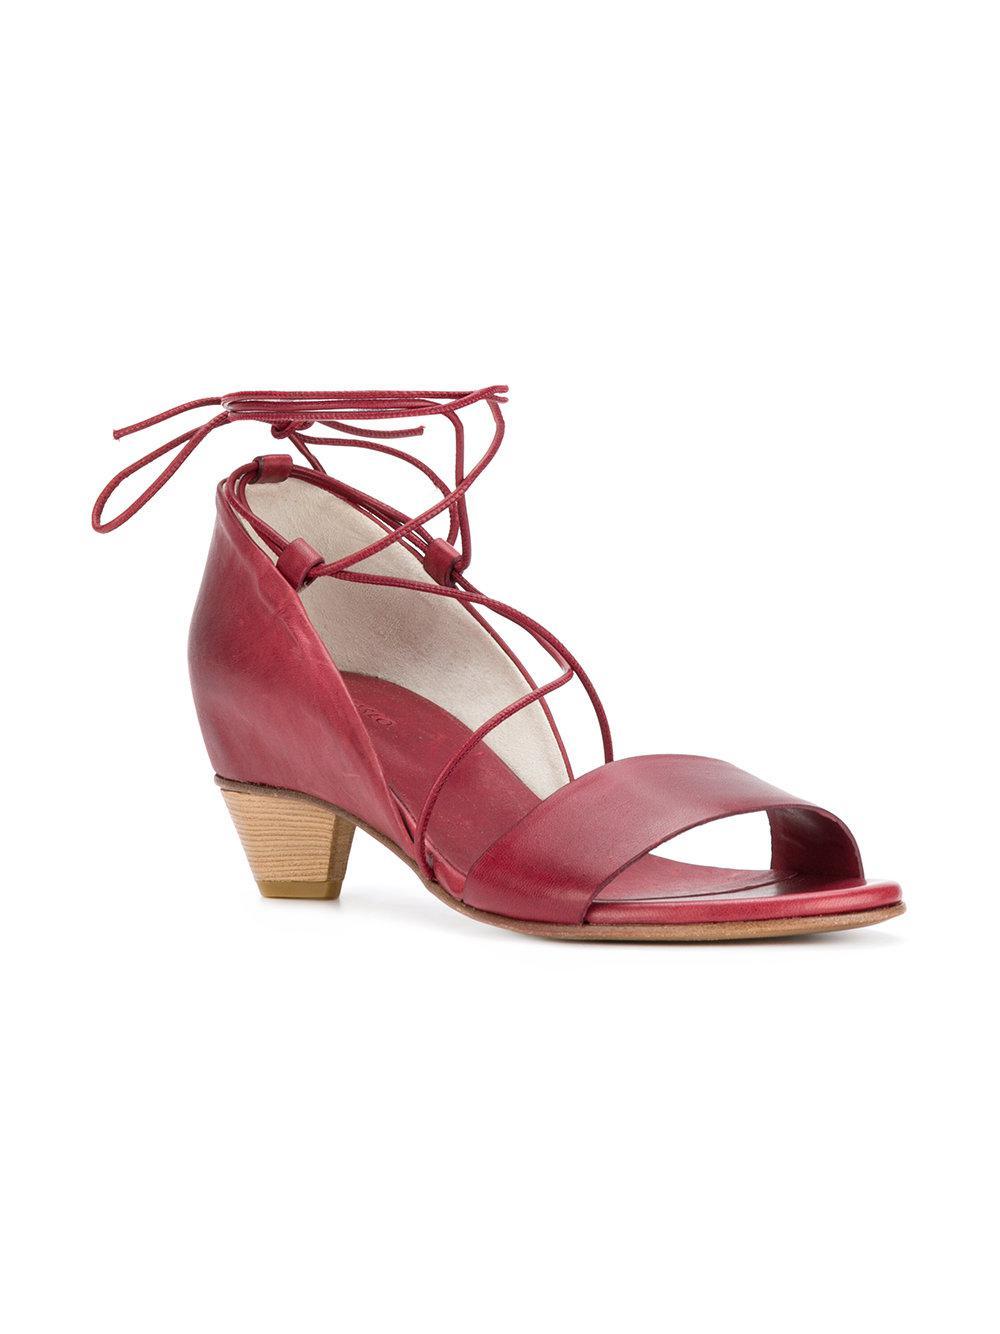 8e2b49da0216b2 Roberto Del Carlo - Red Ankle Tie Low Heel Sandals - Lyst. View fullscreen